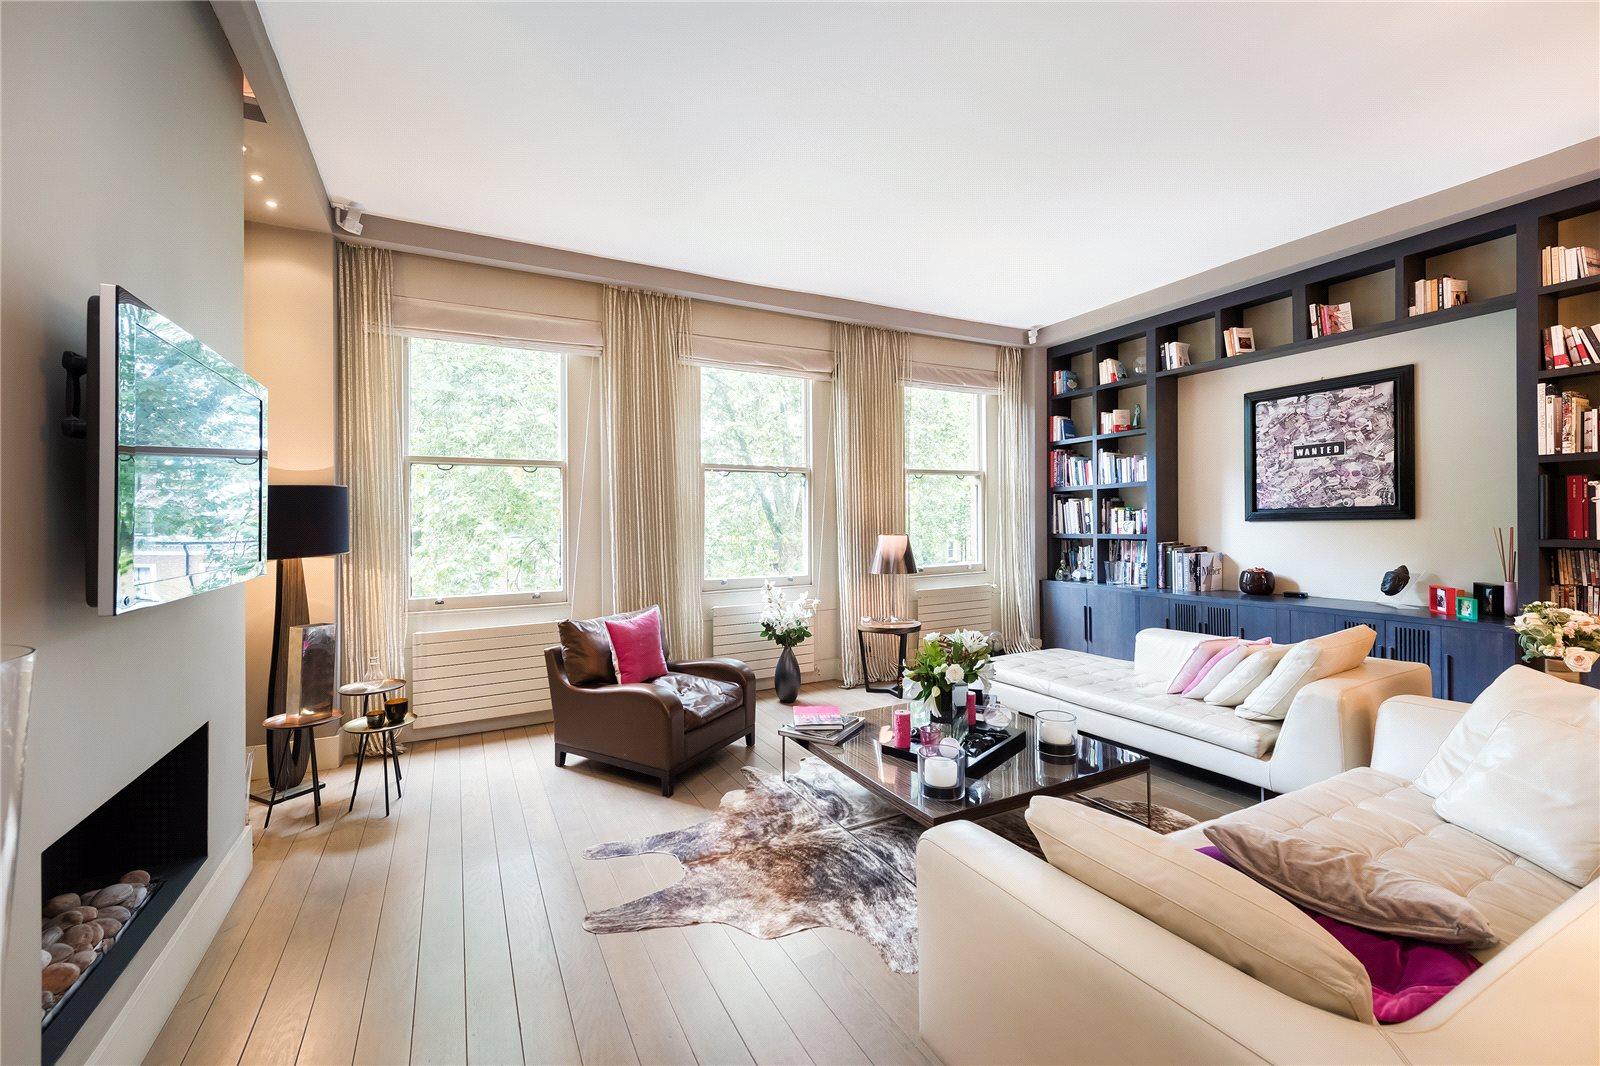 Апартаменты / Квартиры для того Продажа на Harrington Gardens, South Kensington, London, SW7 South Kensington, London, Англия